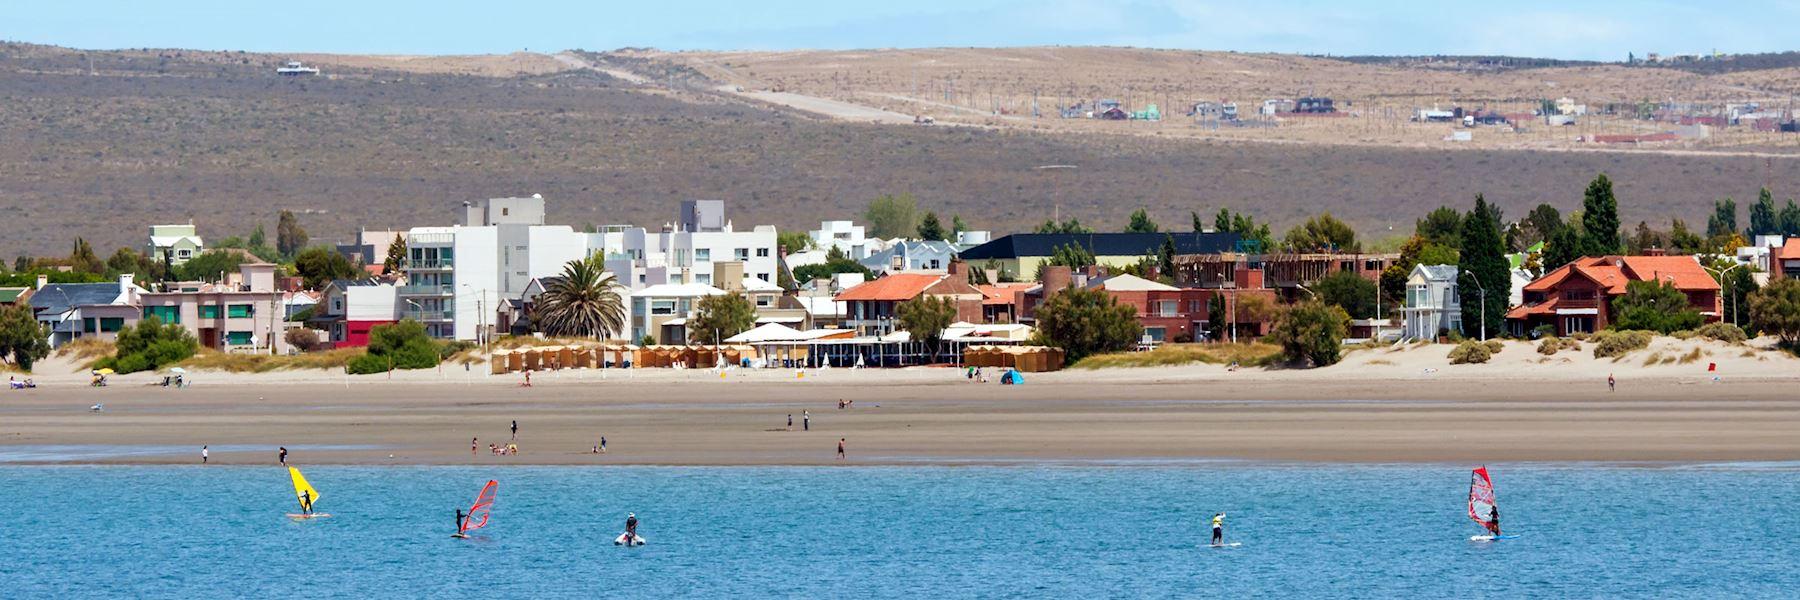 Visit Puerto Madryn, Argentina